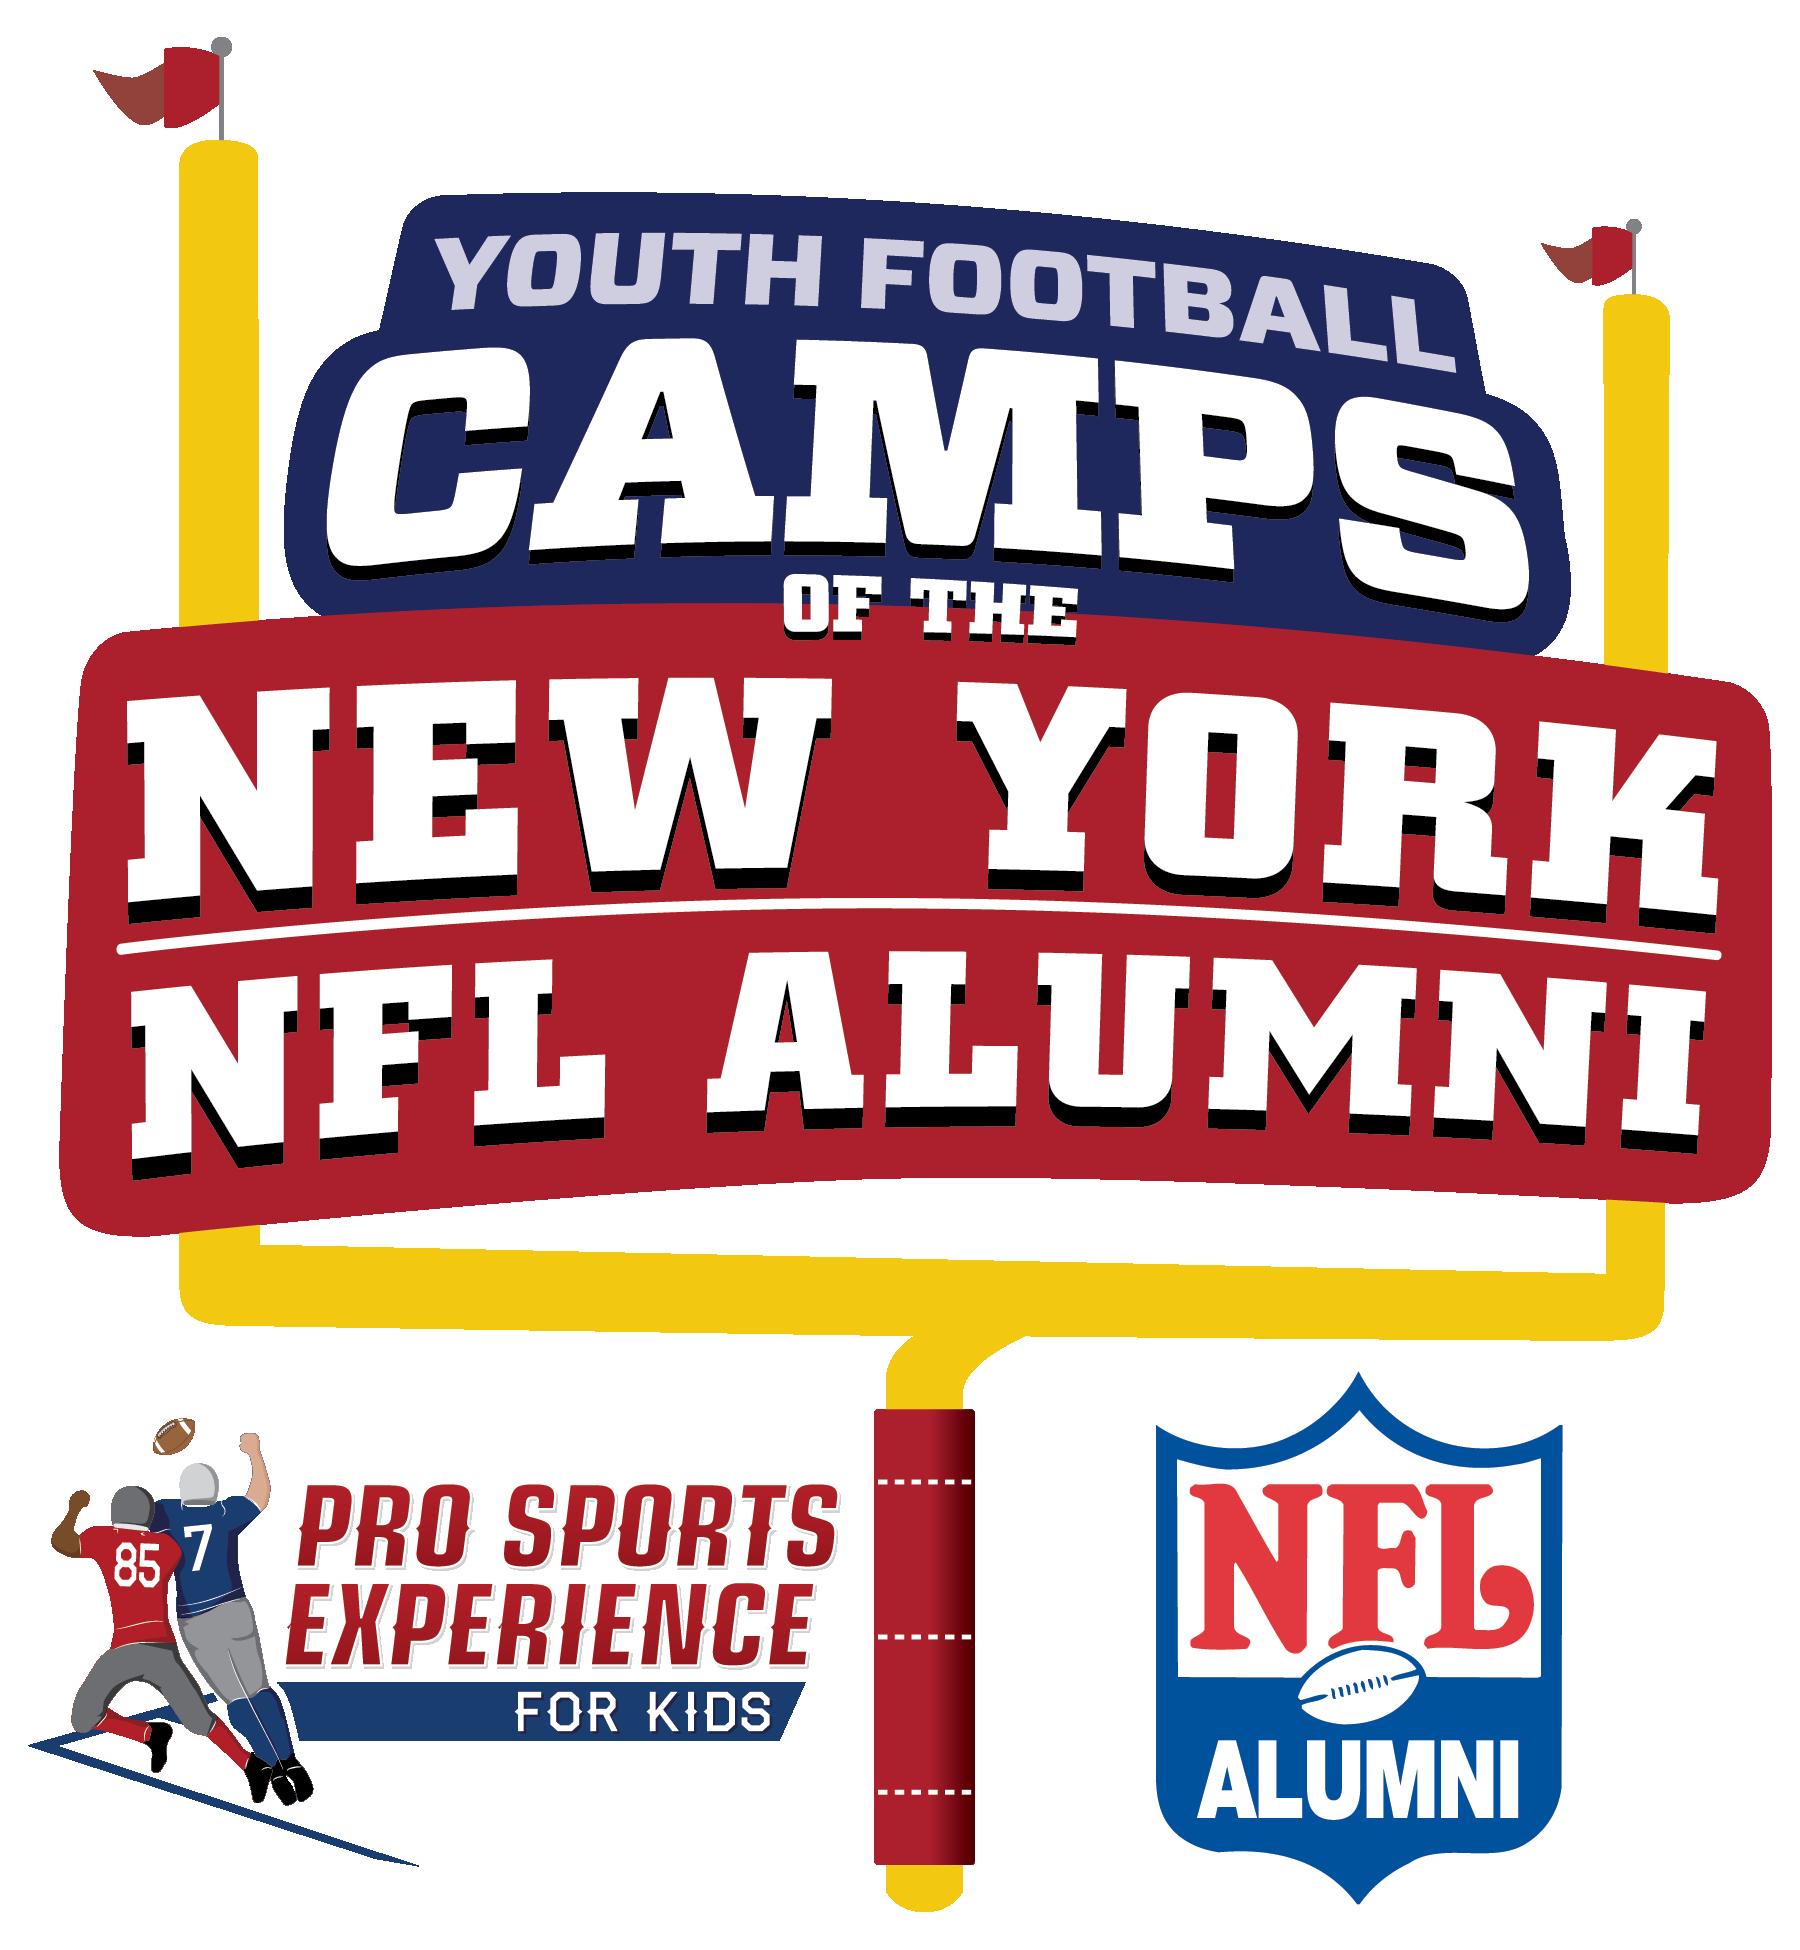 New York NFL Alumni Hero Youth Football Camps - Stamford